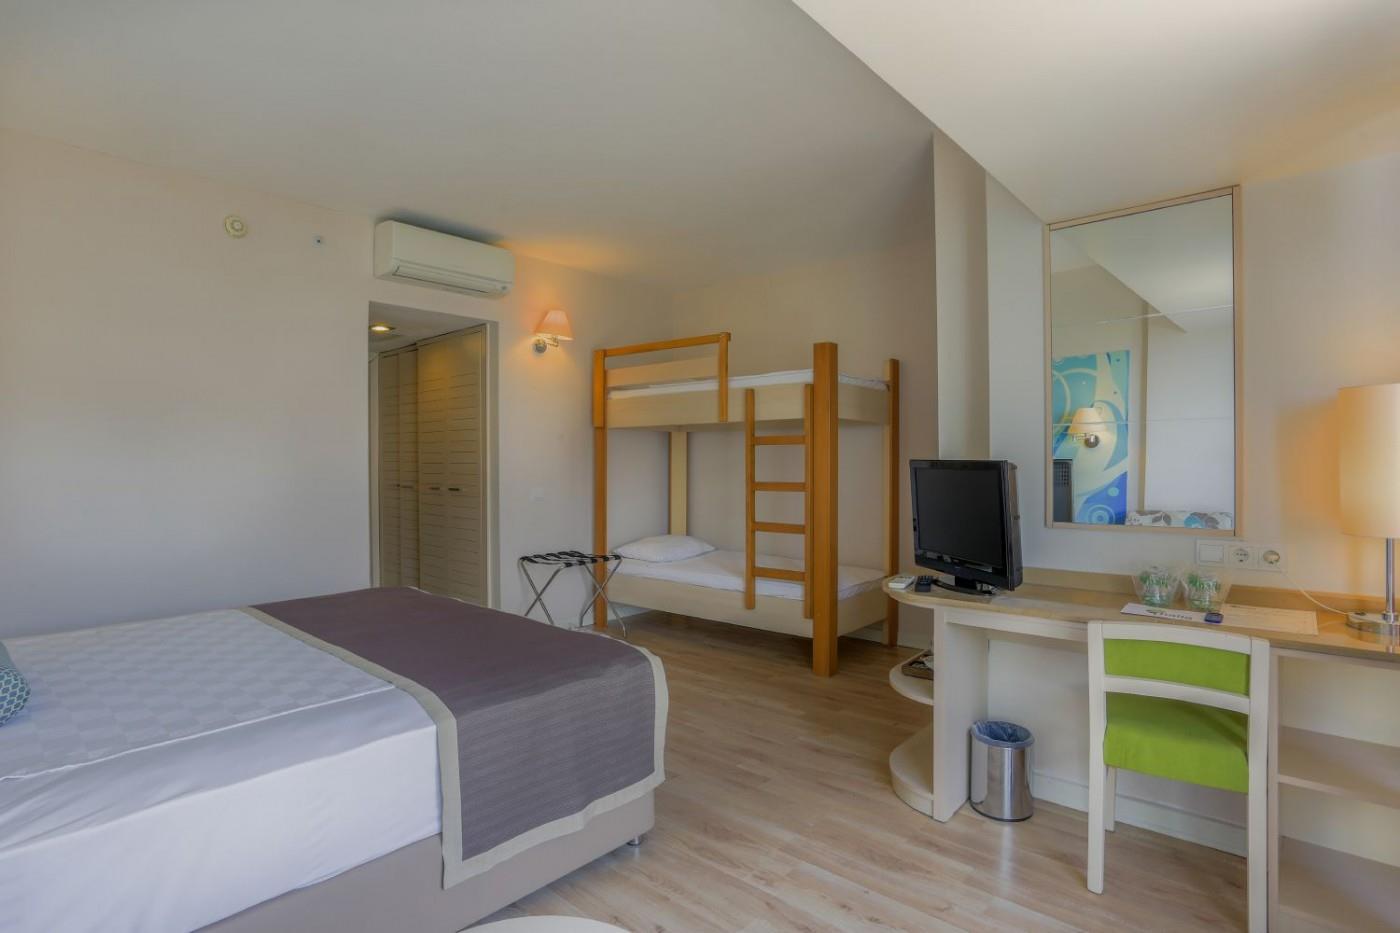 http://www.orextravel.sk/OREX/hotelphotos/thalia-unique-area-0034.jpg